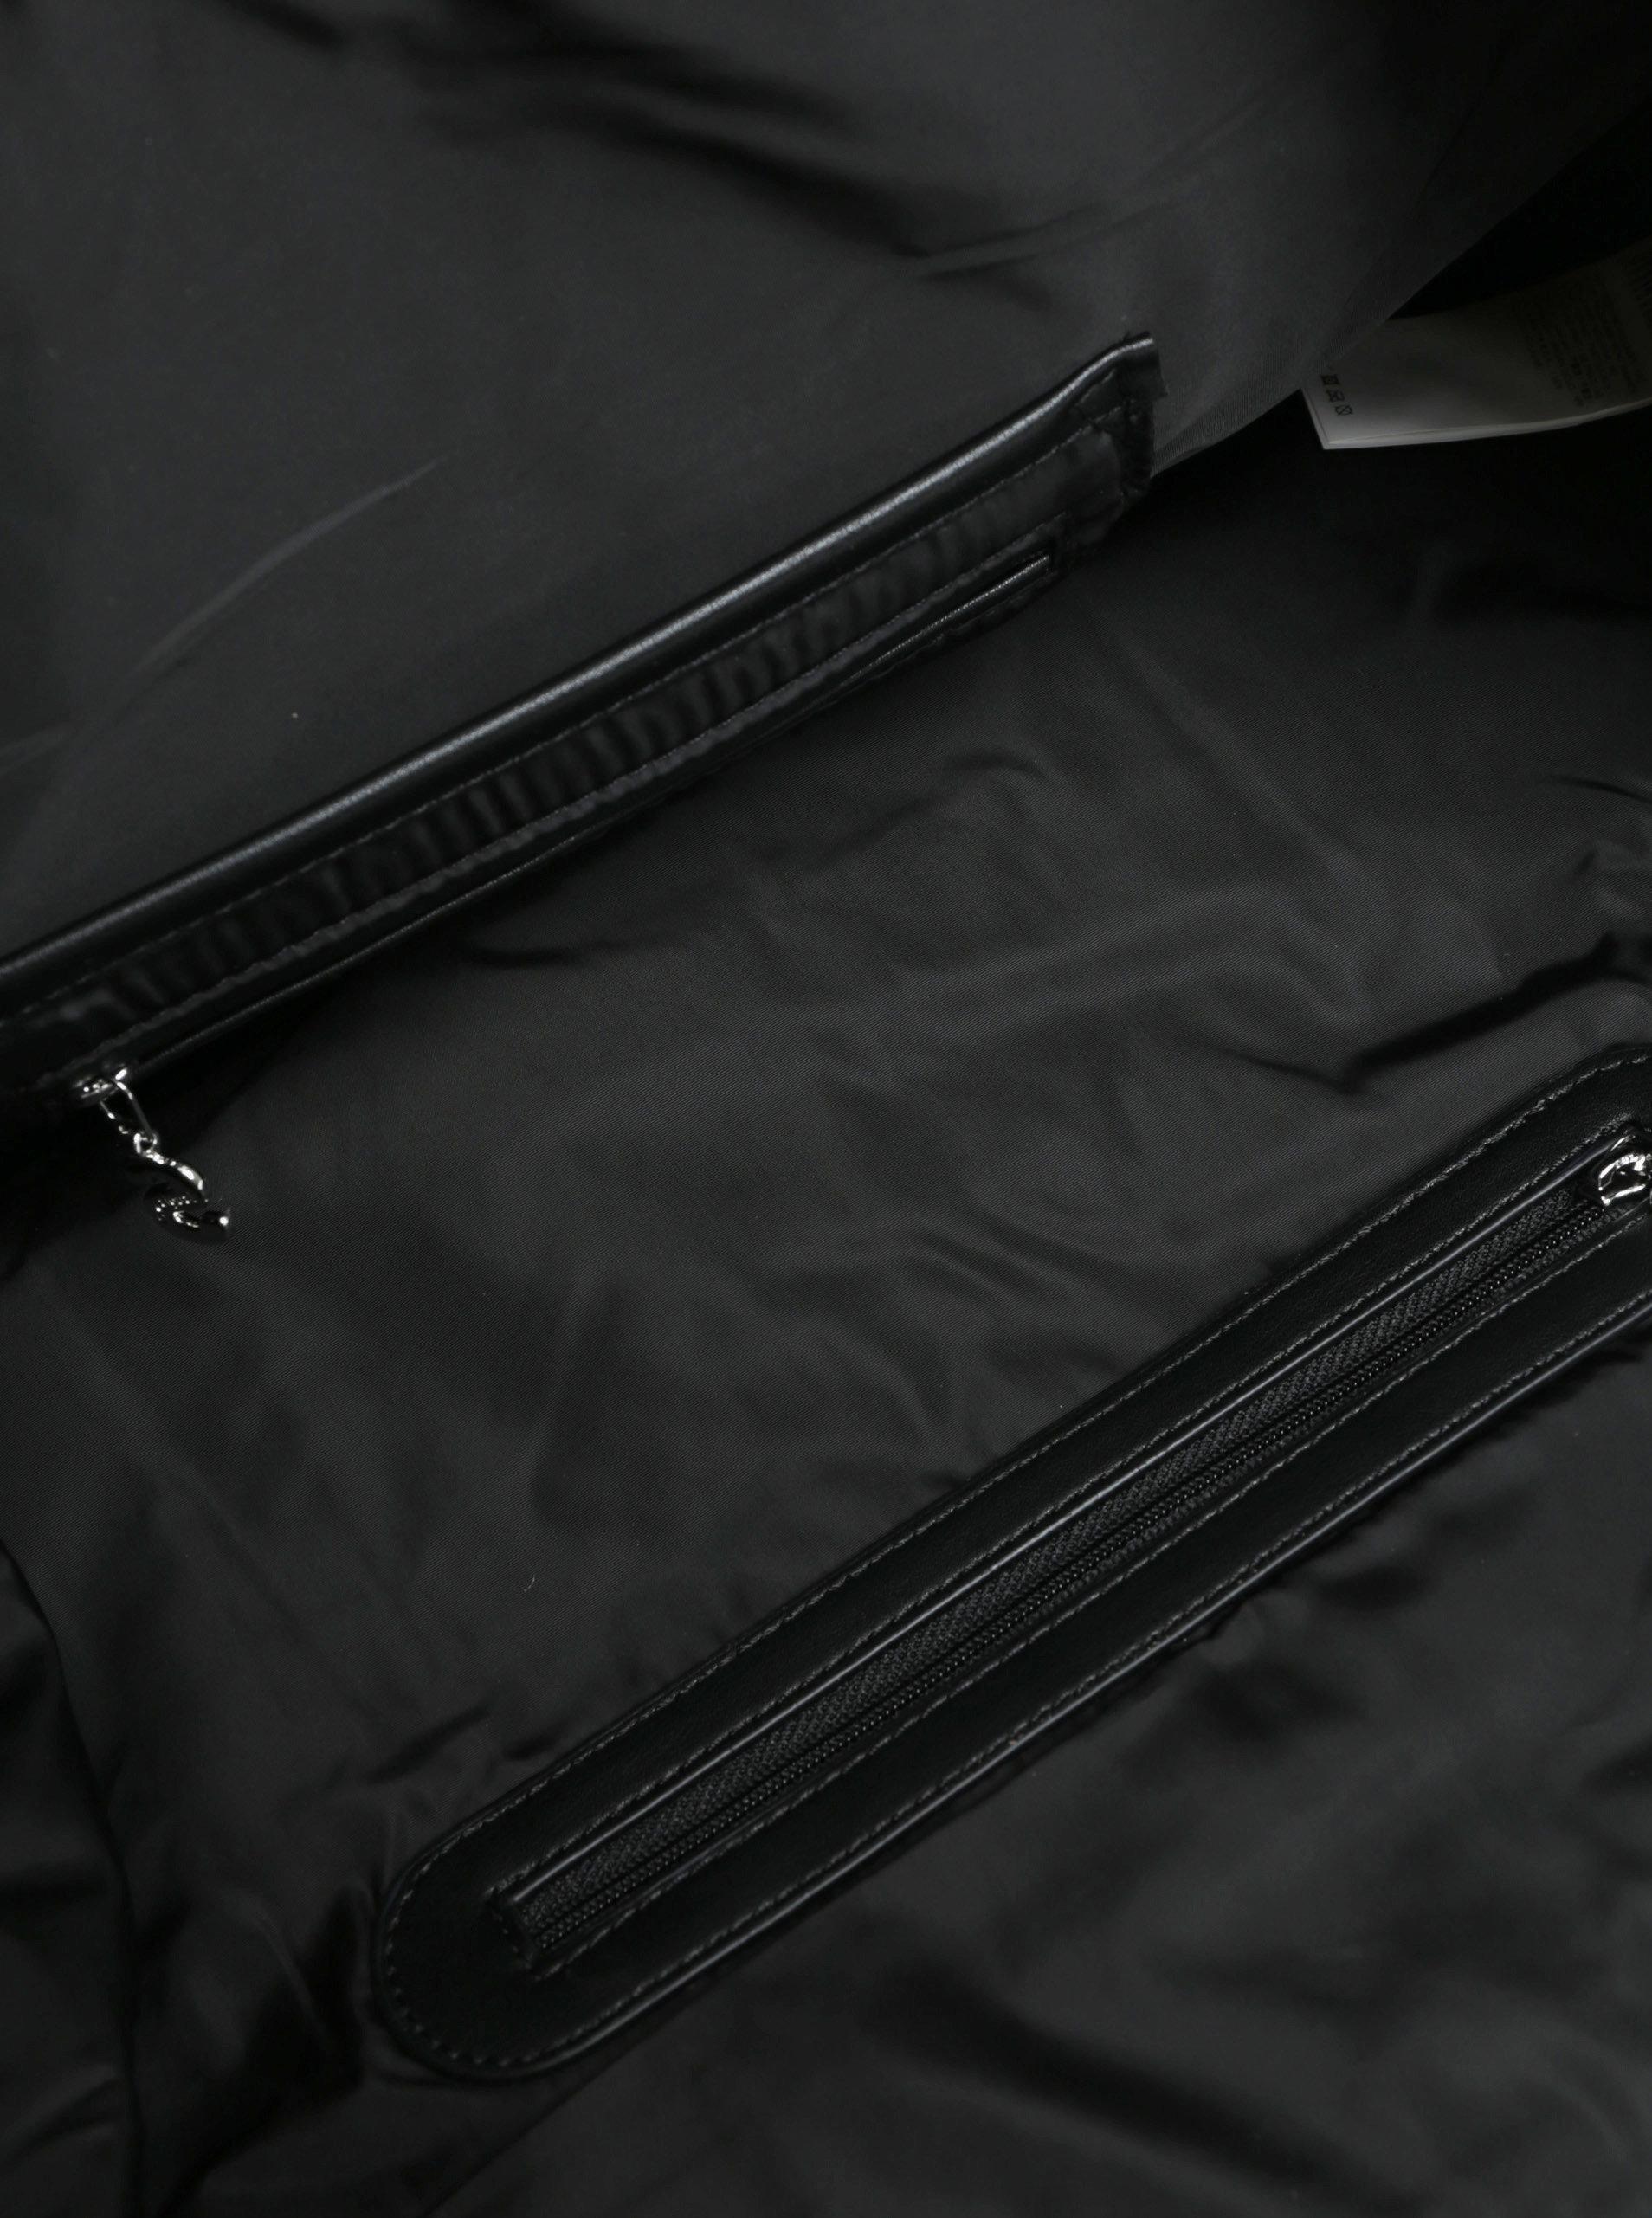 2eacadb9a4 Černá prošívaná kabelka Desigual Philadelphia ...